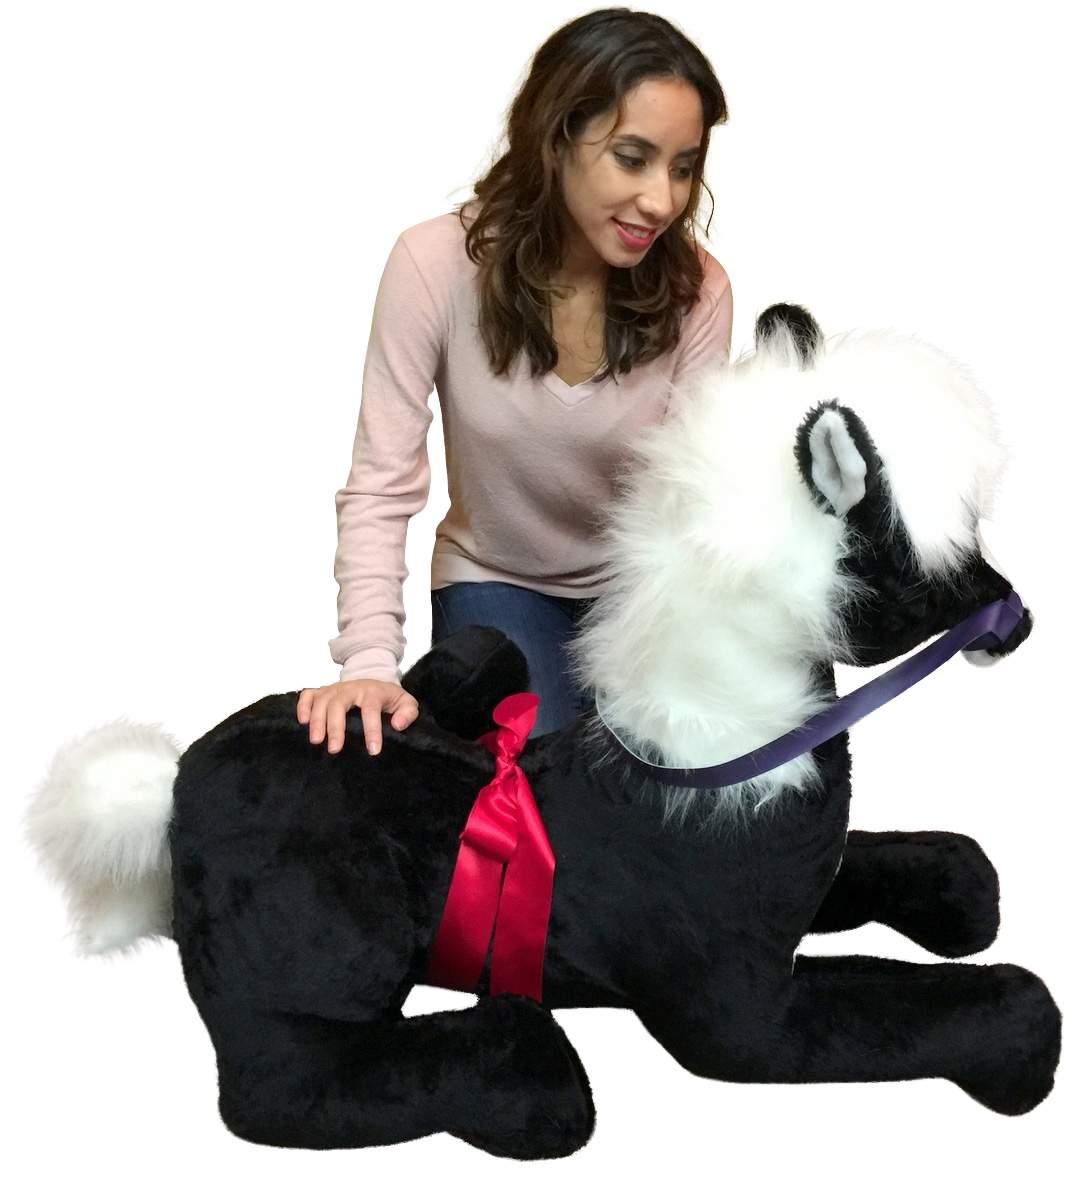 American Made Giant Stuffed Pony 4 Feet Wide 3 Feet Tall Soft Big